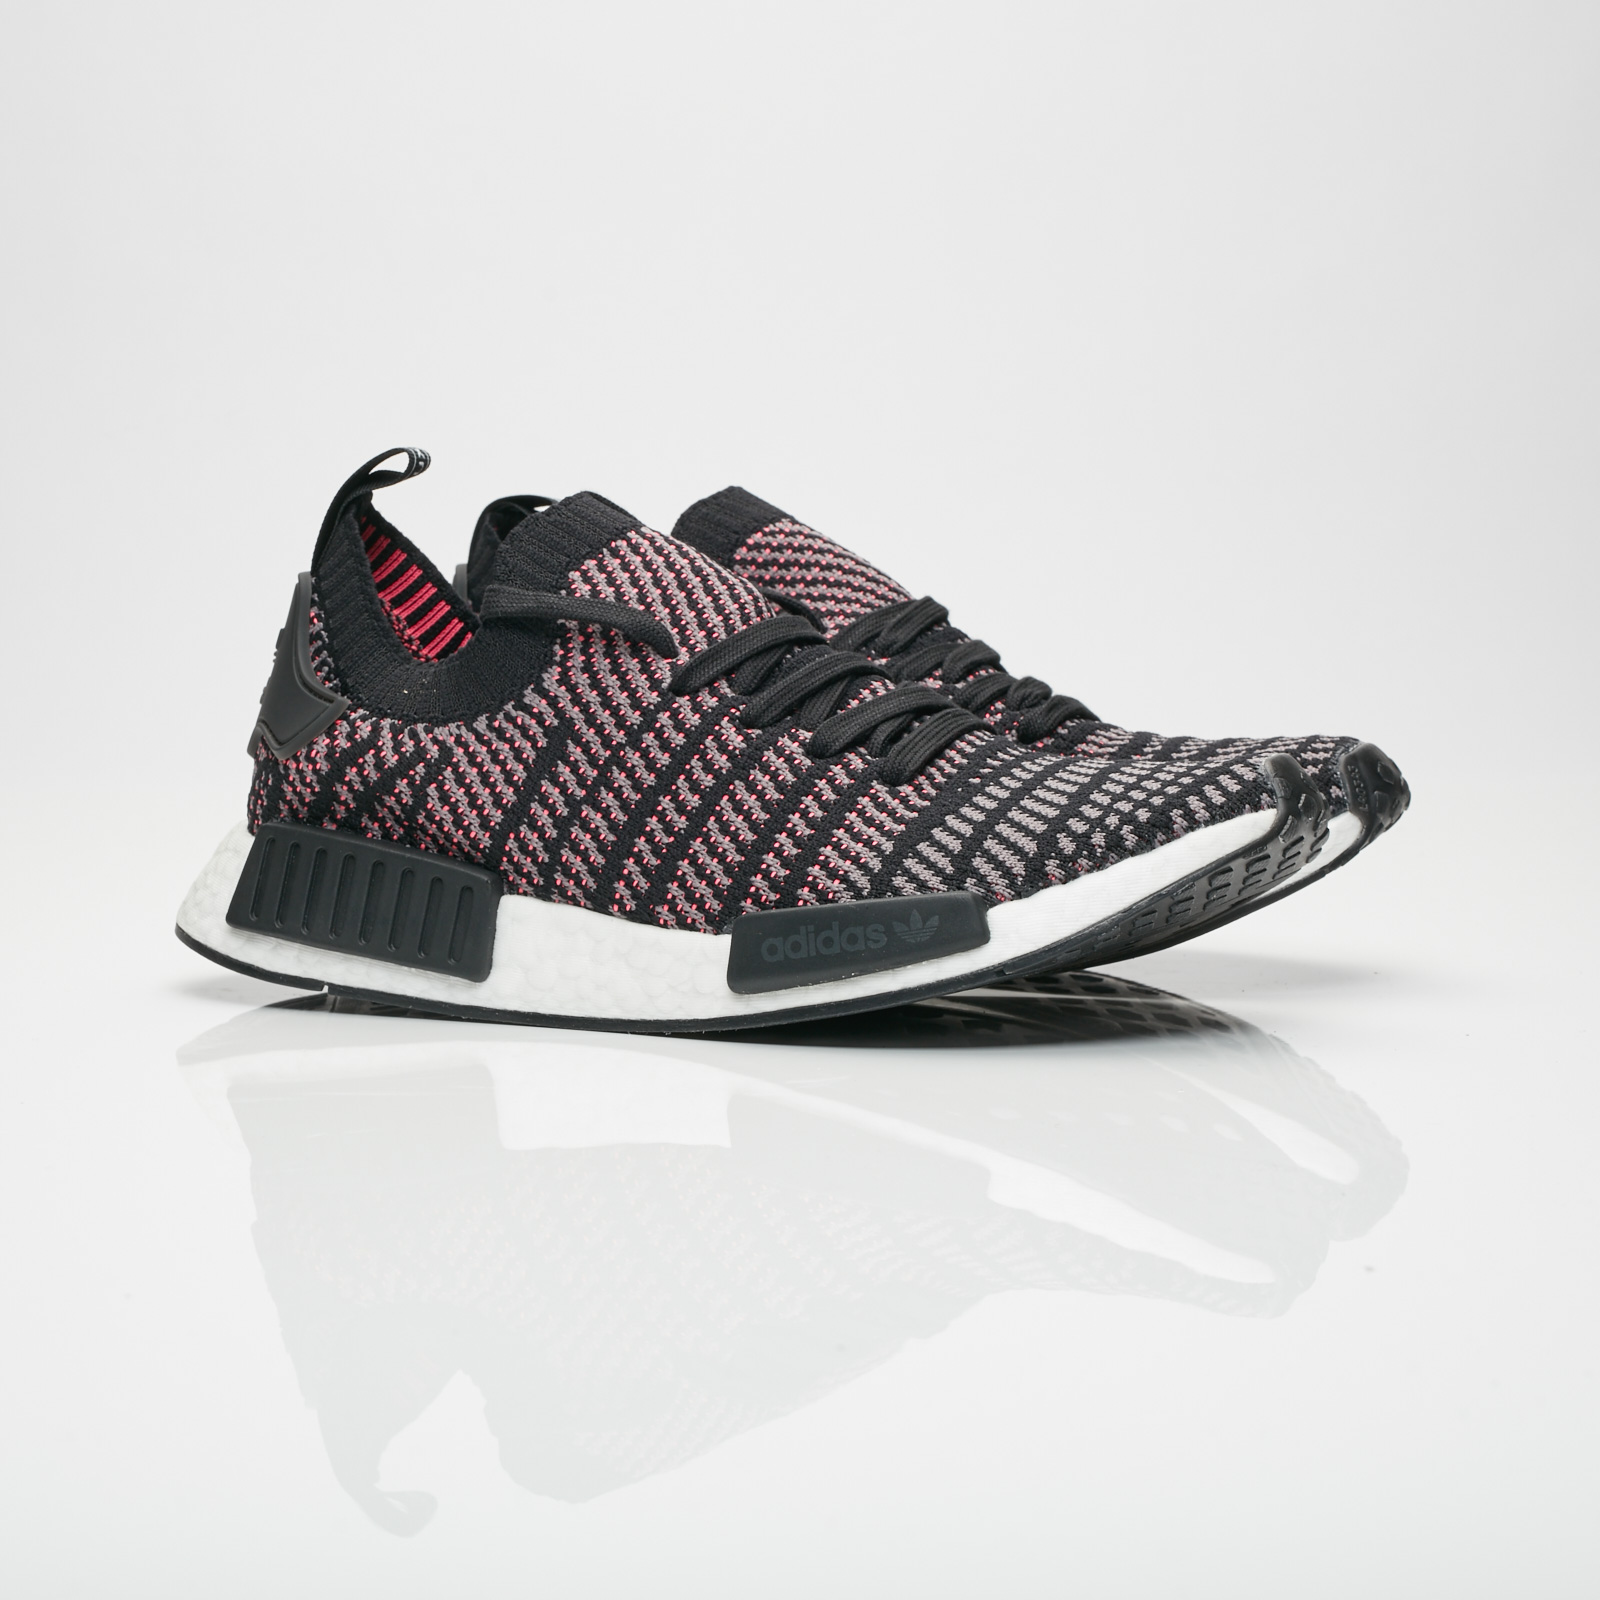 4c69ade57 adidas NMD R1 STLT Primeknit - Cq2386 - Sneakersnstuff